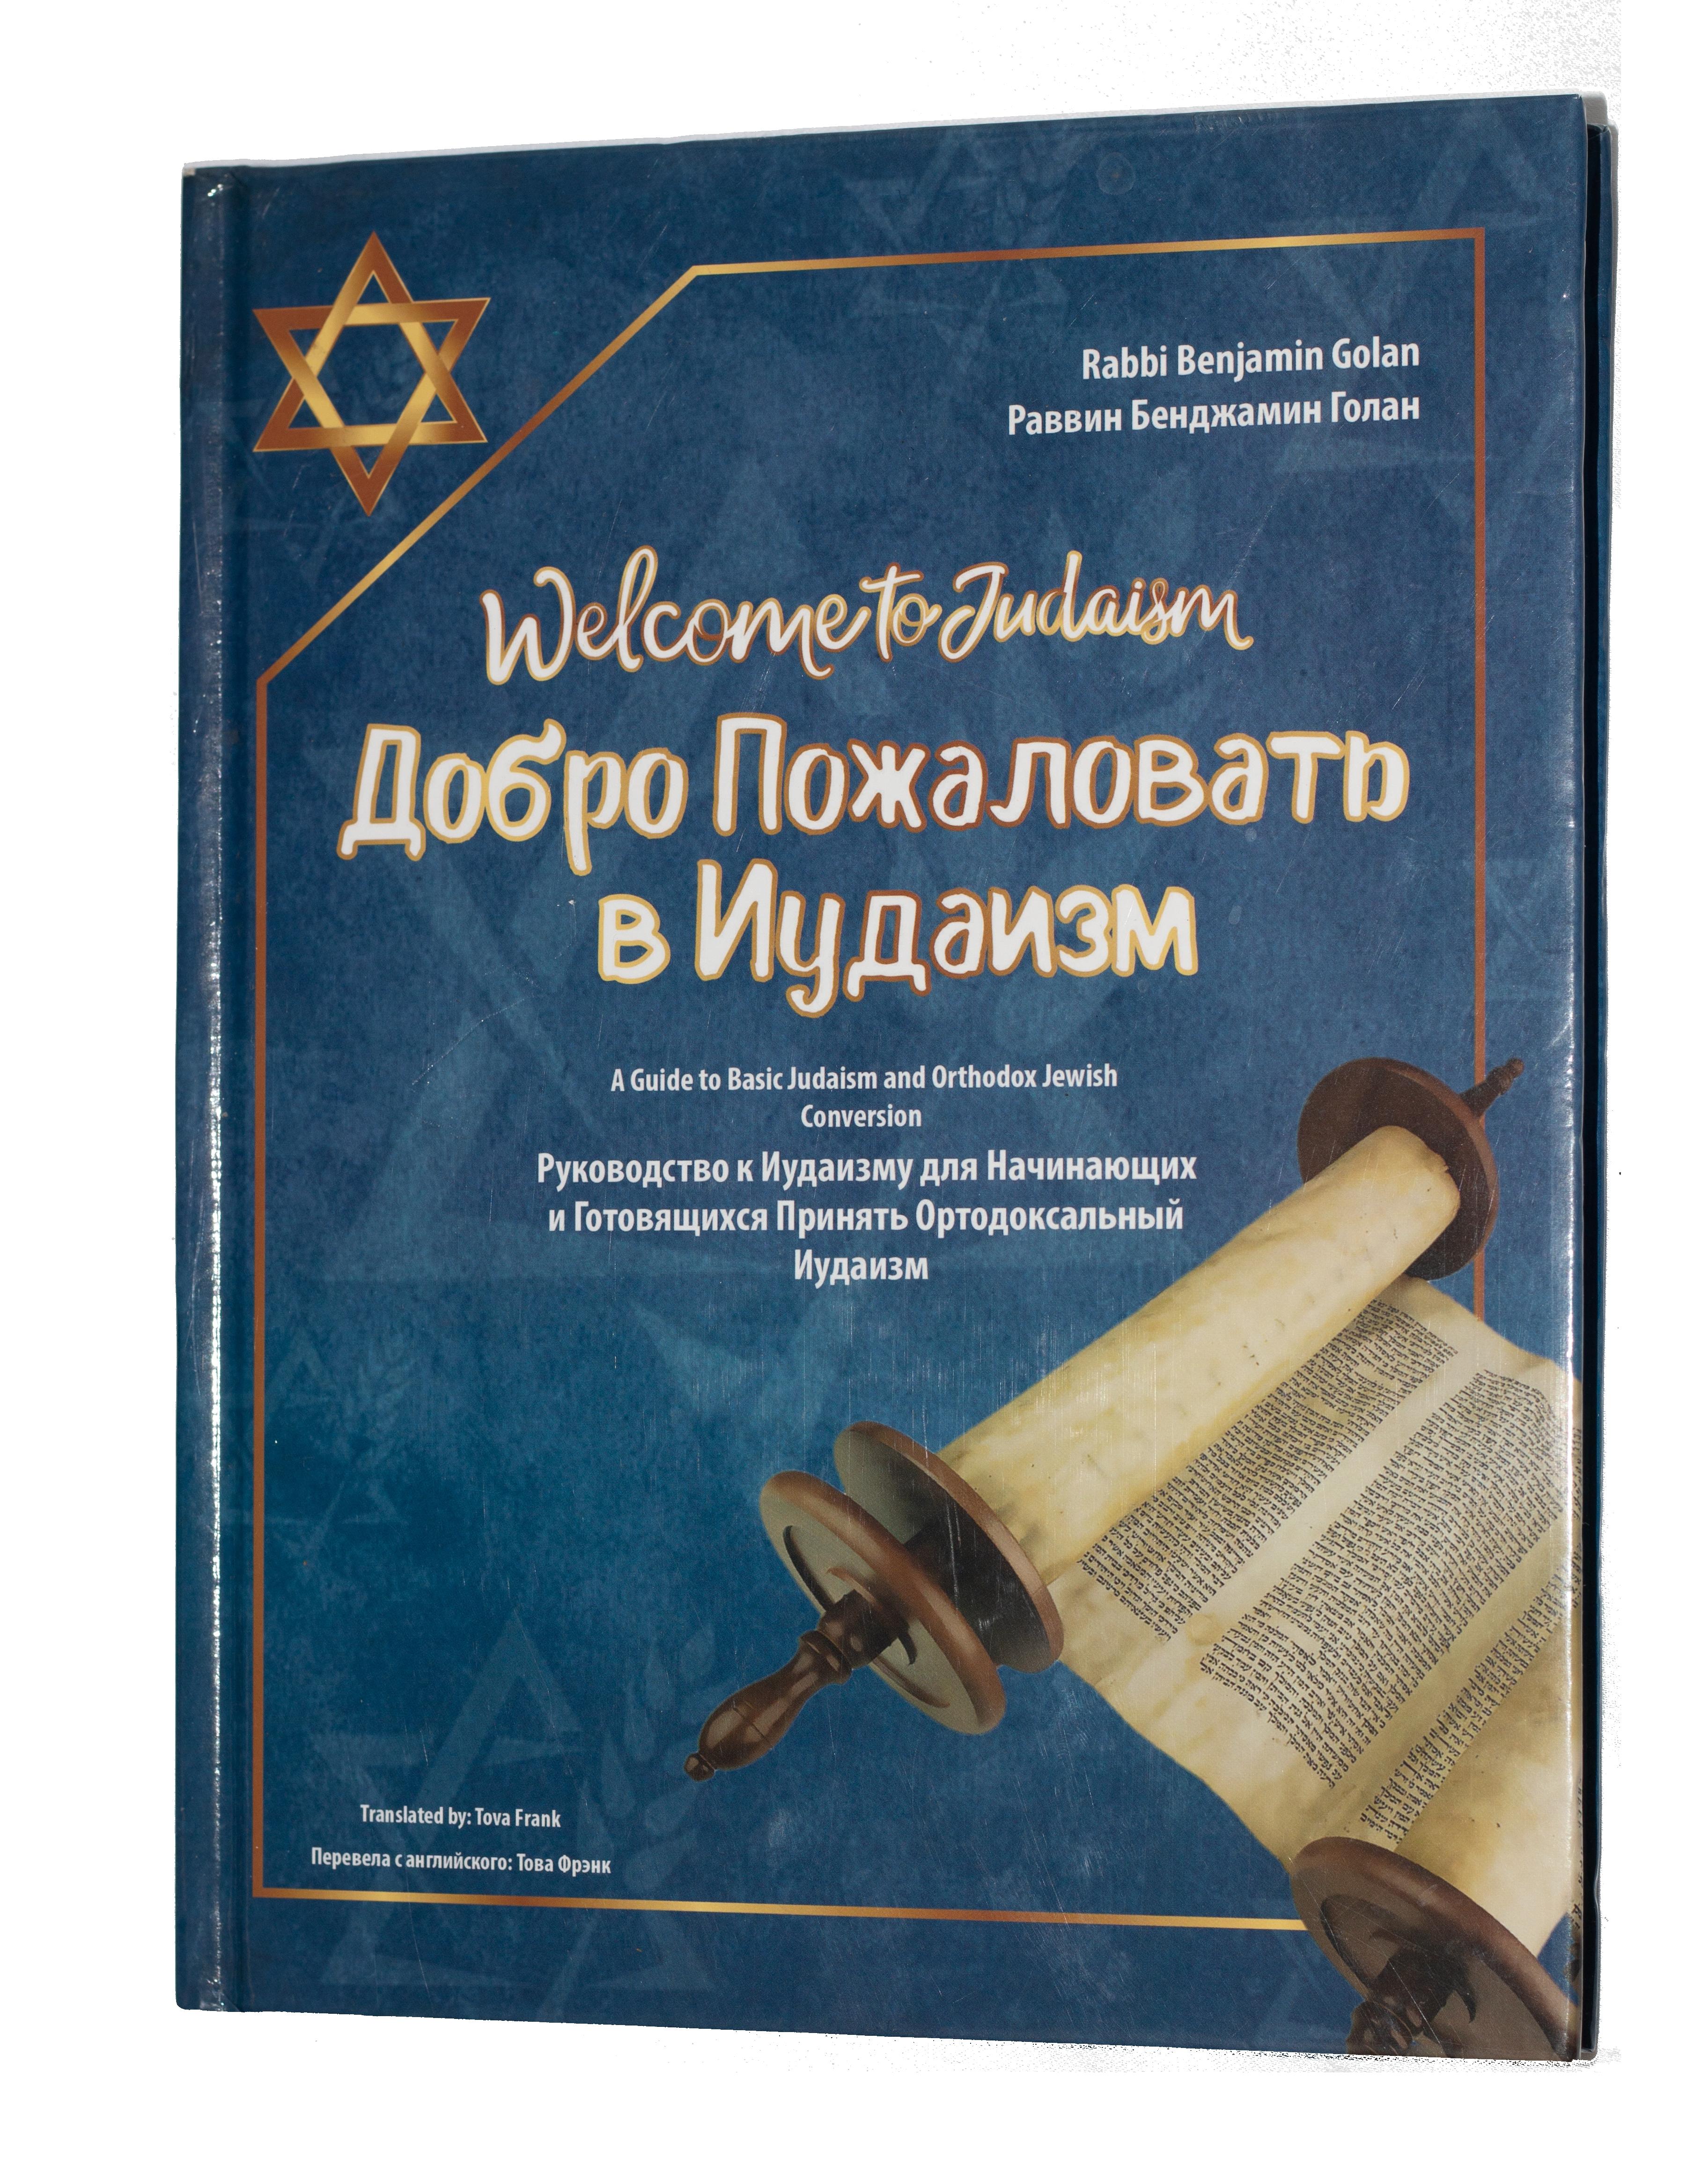 Book: Welcome to Judaism by Rabbi Benjamin Golan